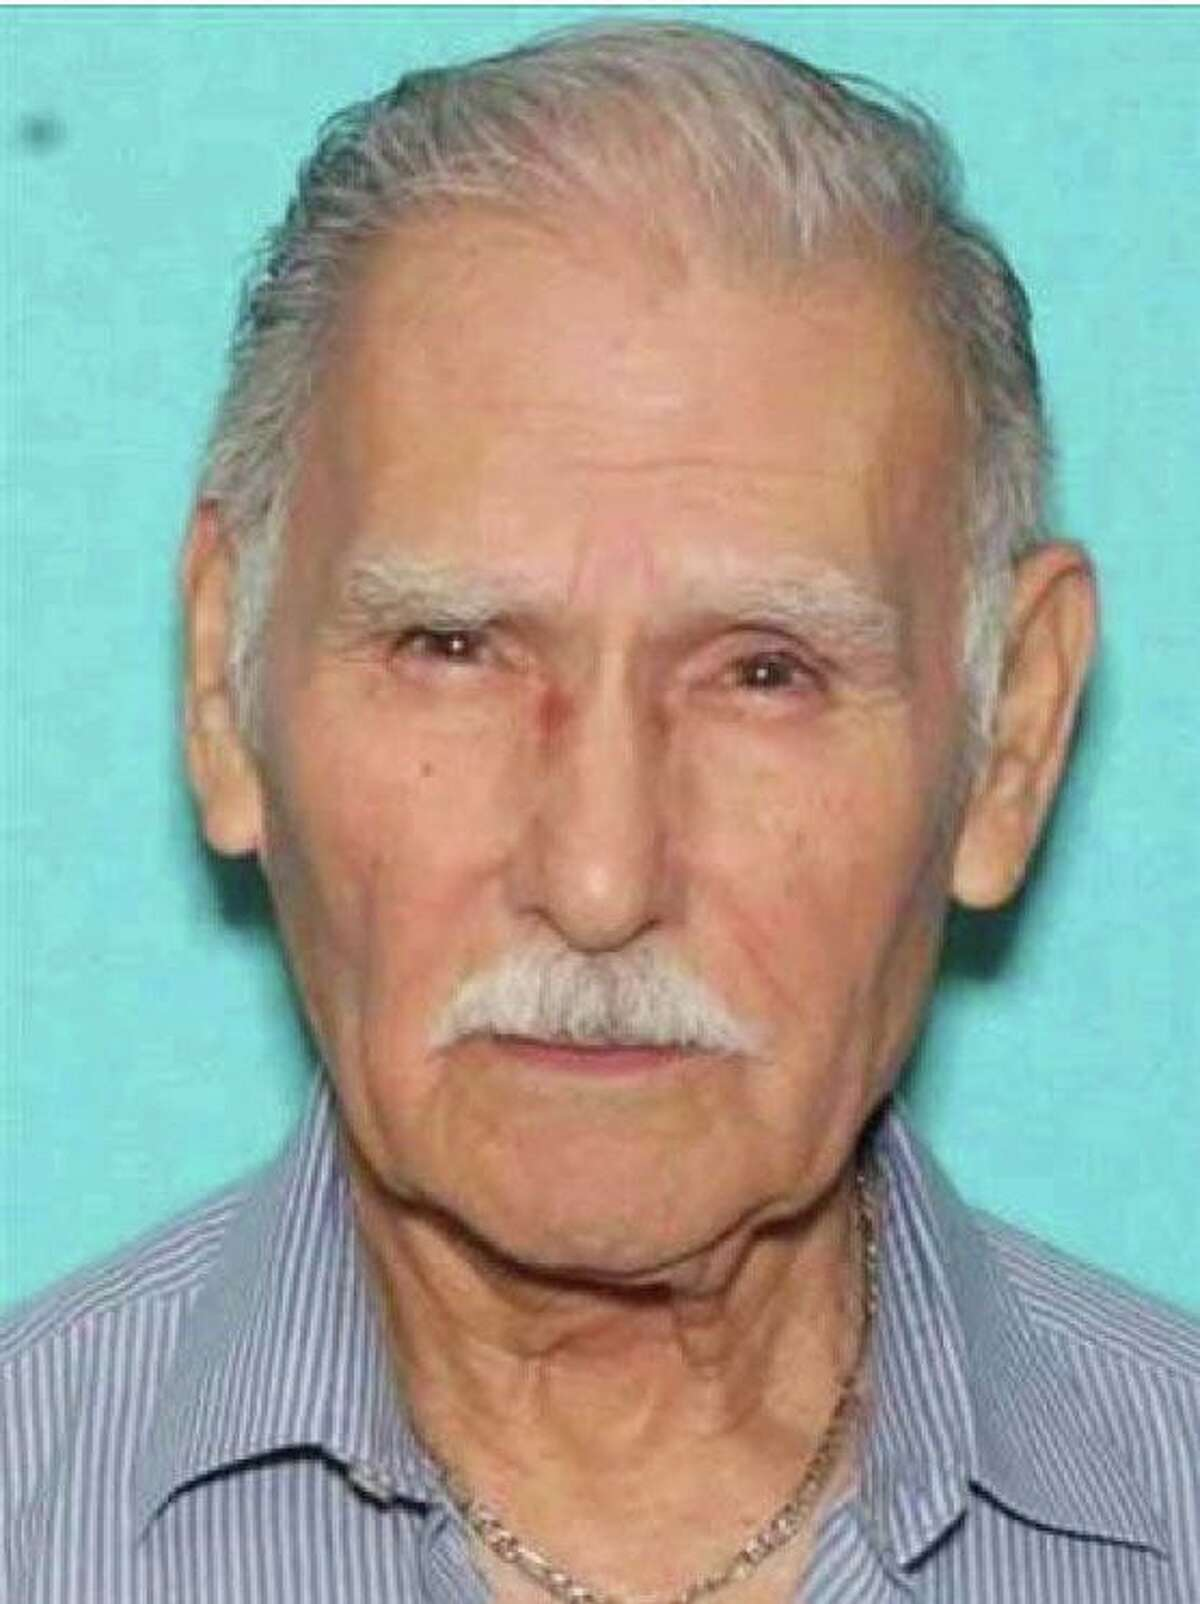 Ambrosio Ruiz Saenz, 84, was last seen Thursday, April 1, 2021, in downtown San Antonio. San Antonio police are searching for him.